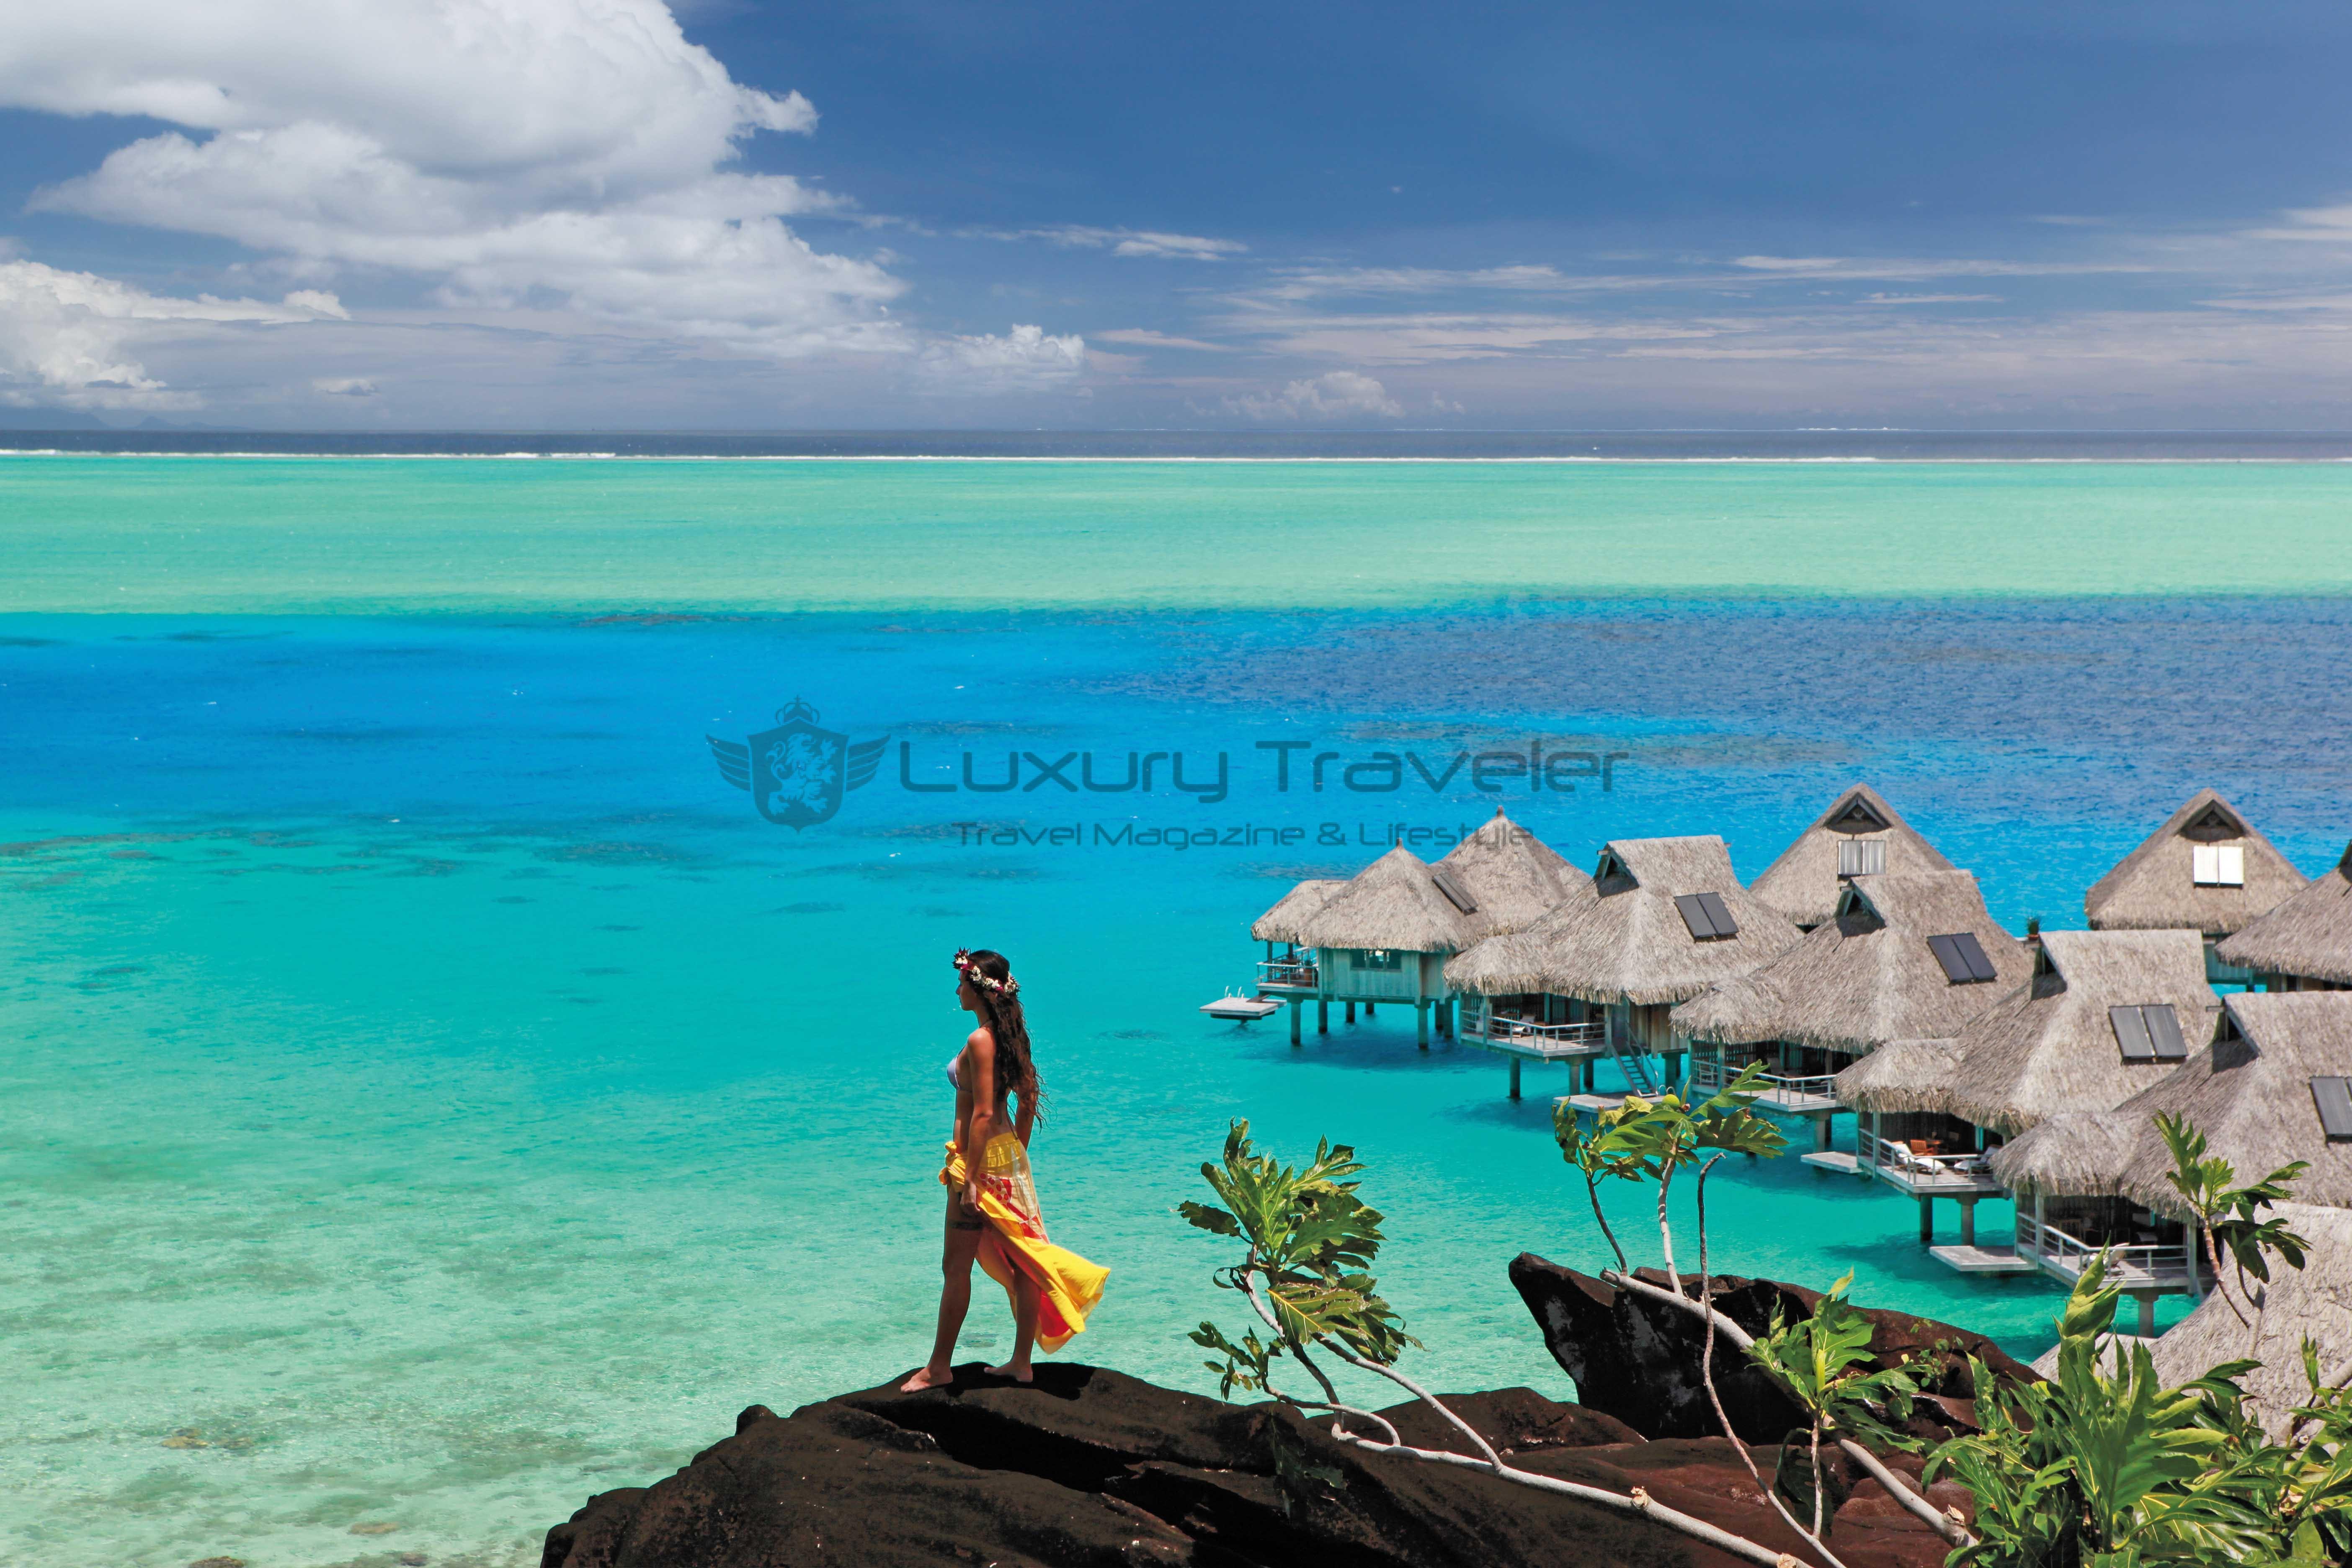 luxury hilton bora bora nui resort french polynesia luxury traveler. Black Bedroom Furniture Sets. Home Design Ideas